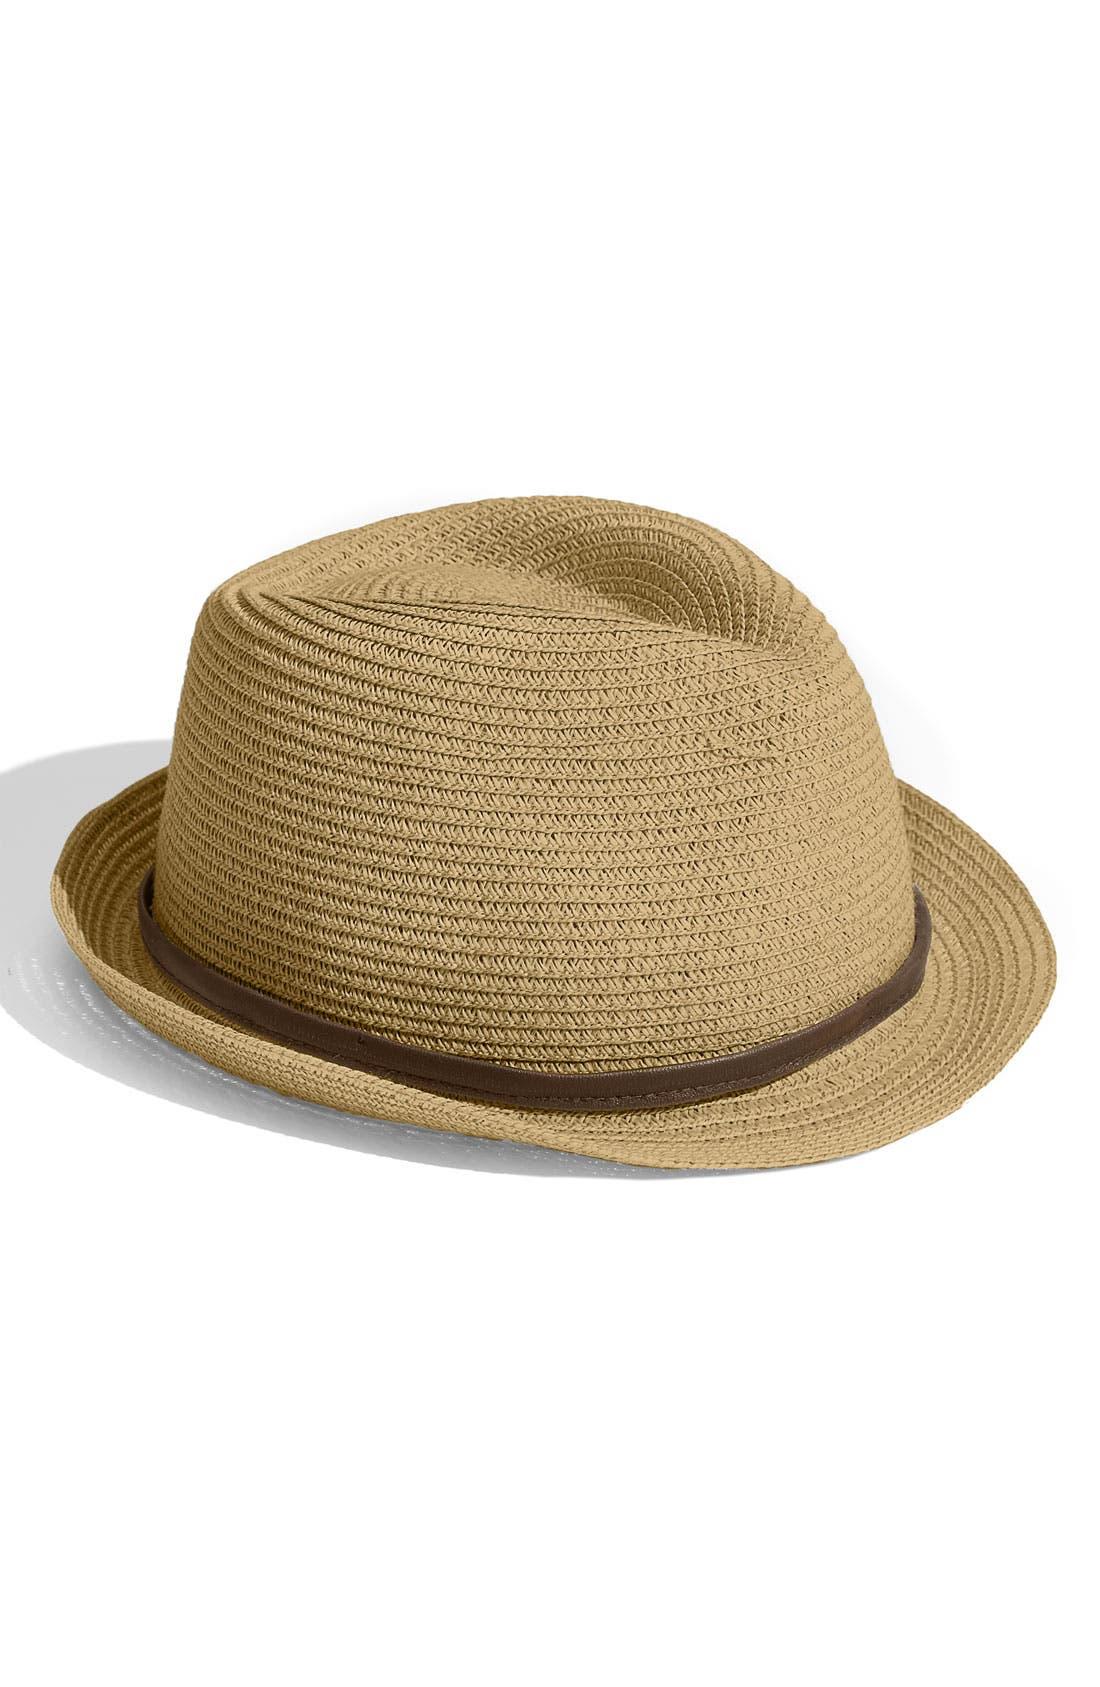 Alternate Image 1 Selected - Make + Model Straw Bowler Hat